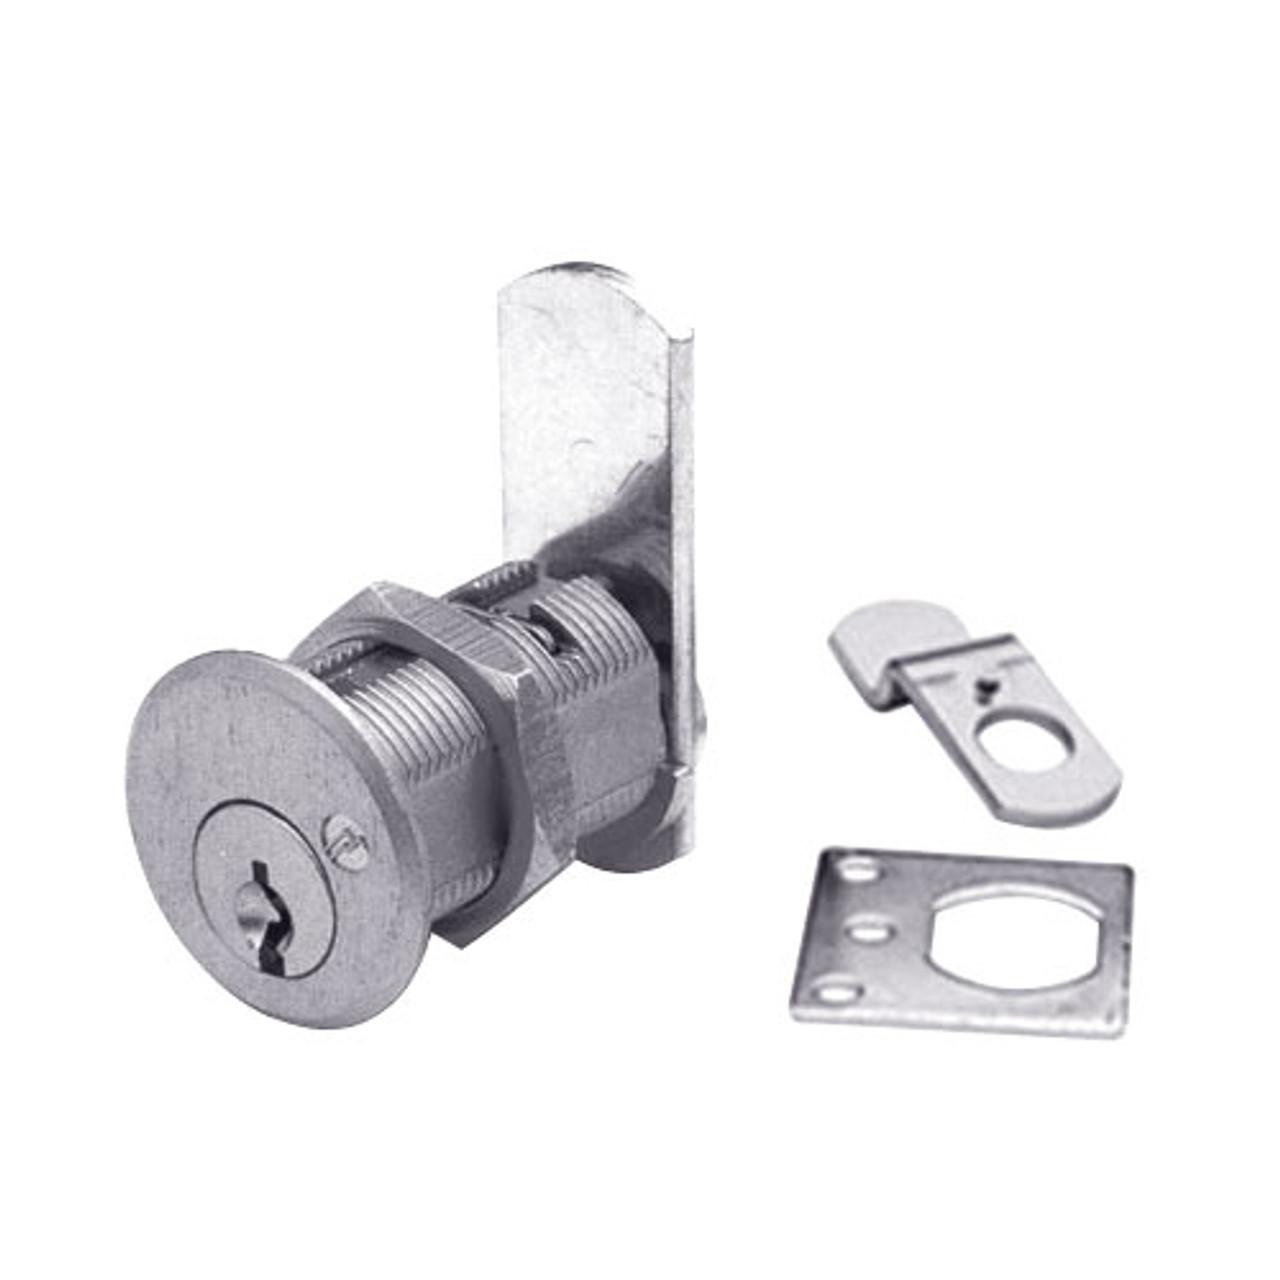 Olympus DCN3-KD-26D Cam Locks in Satin Chrome Finish